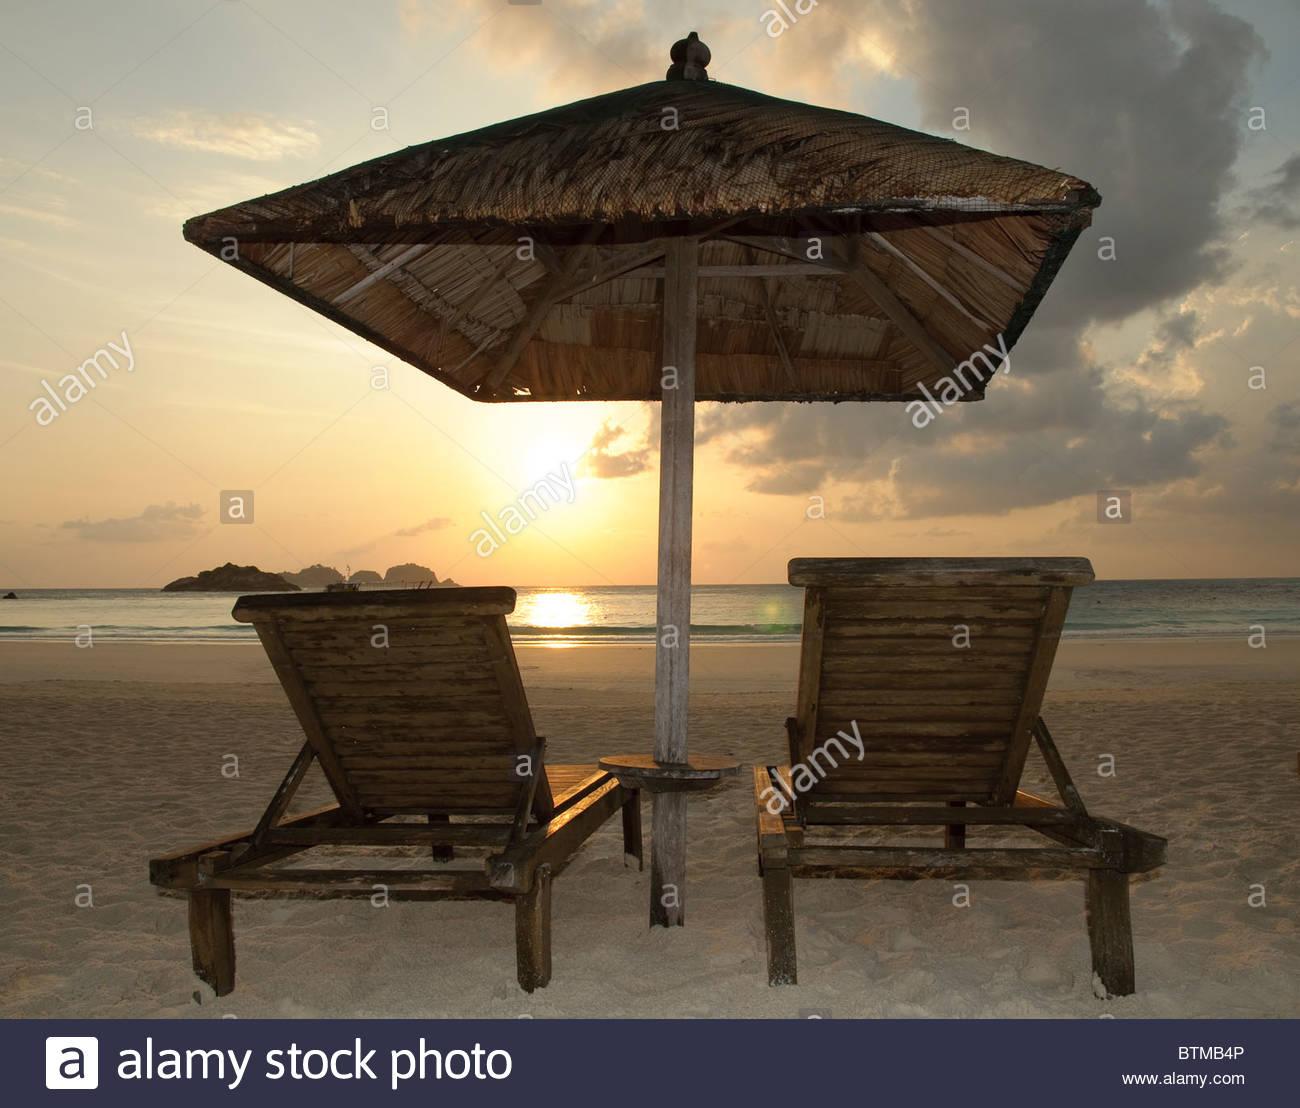 Two beach chairs at sunrise, Pulau Redang Island, Malaysia, Southeast Asia, Asia Stock Photo